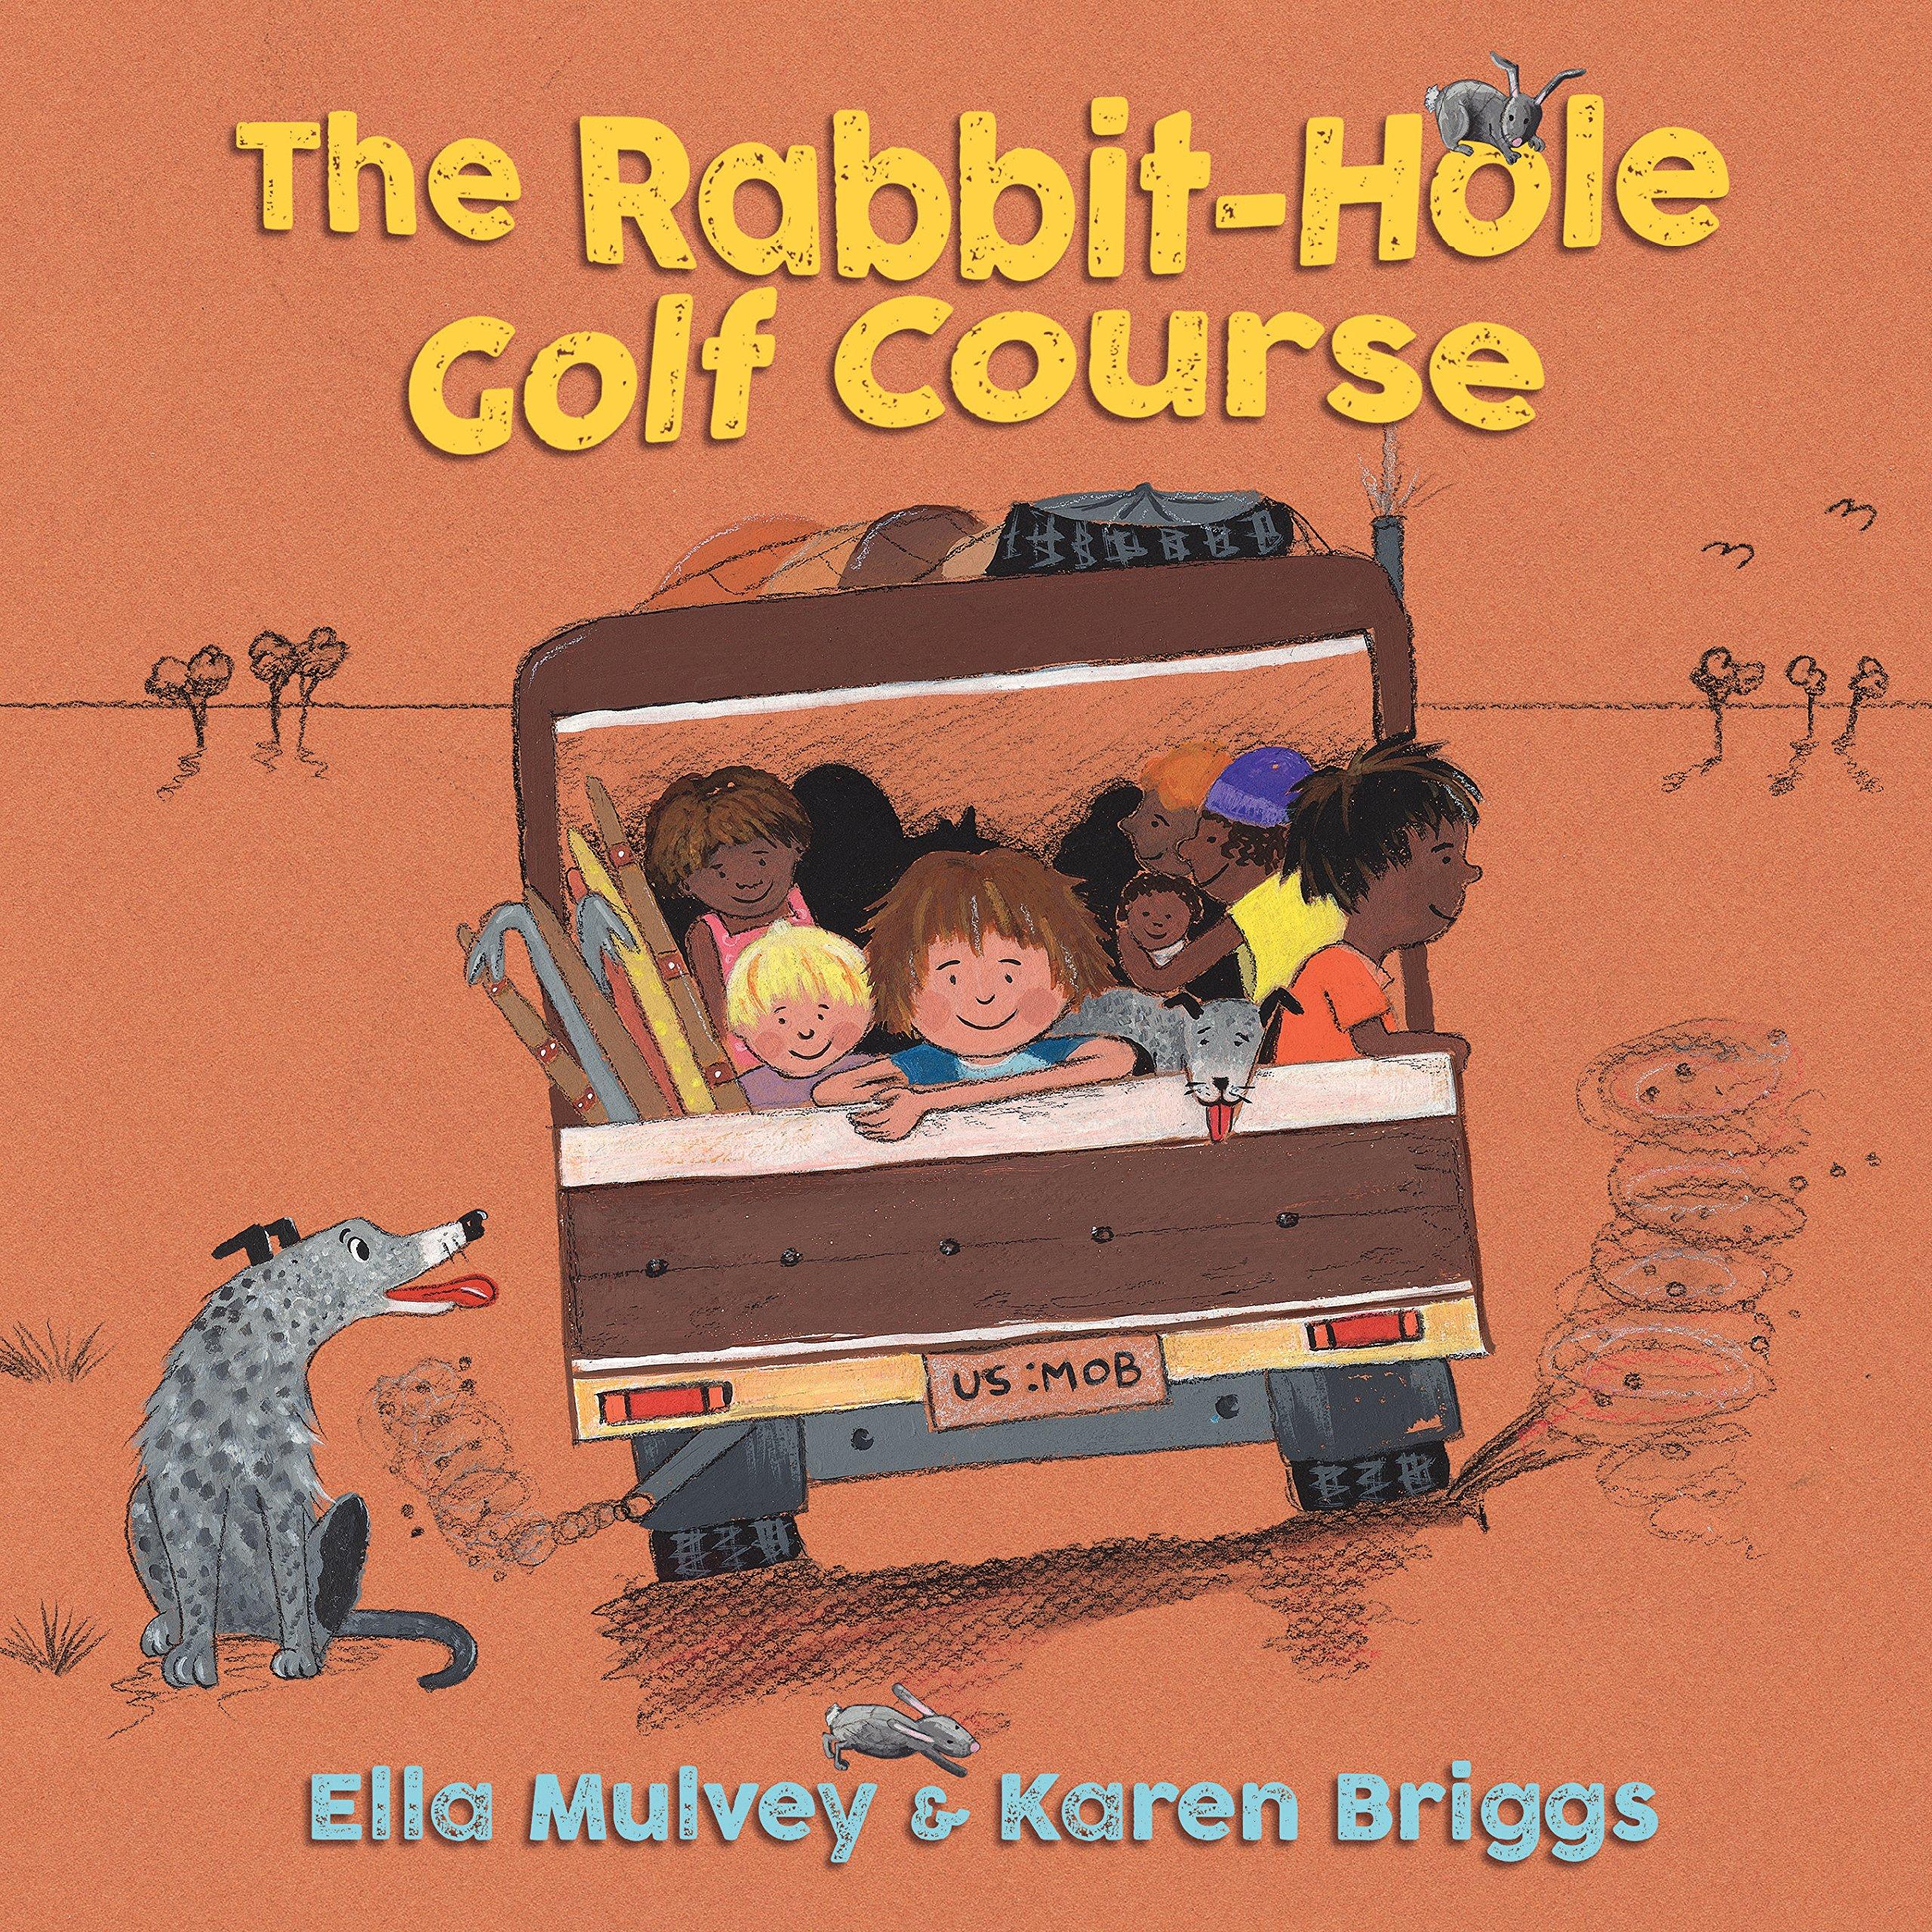 rabbit-hole-golf-course